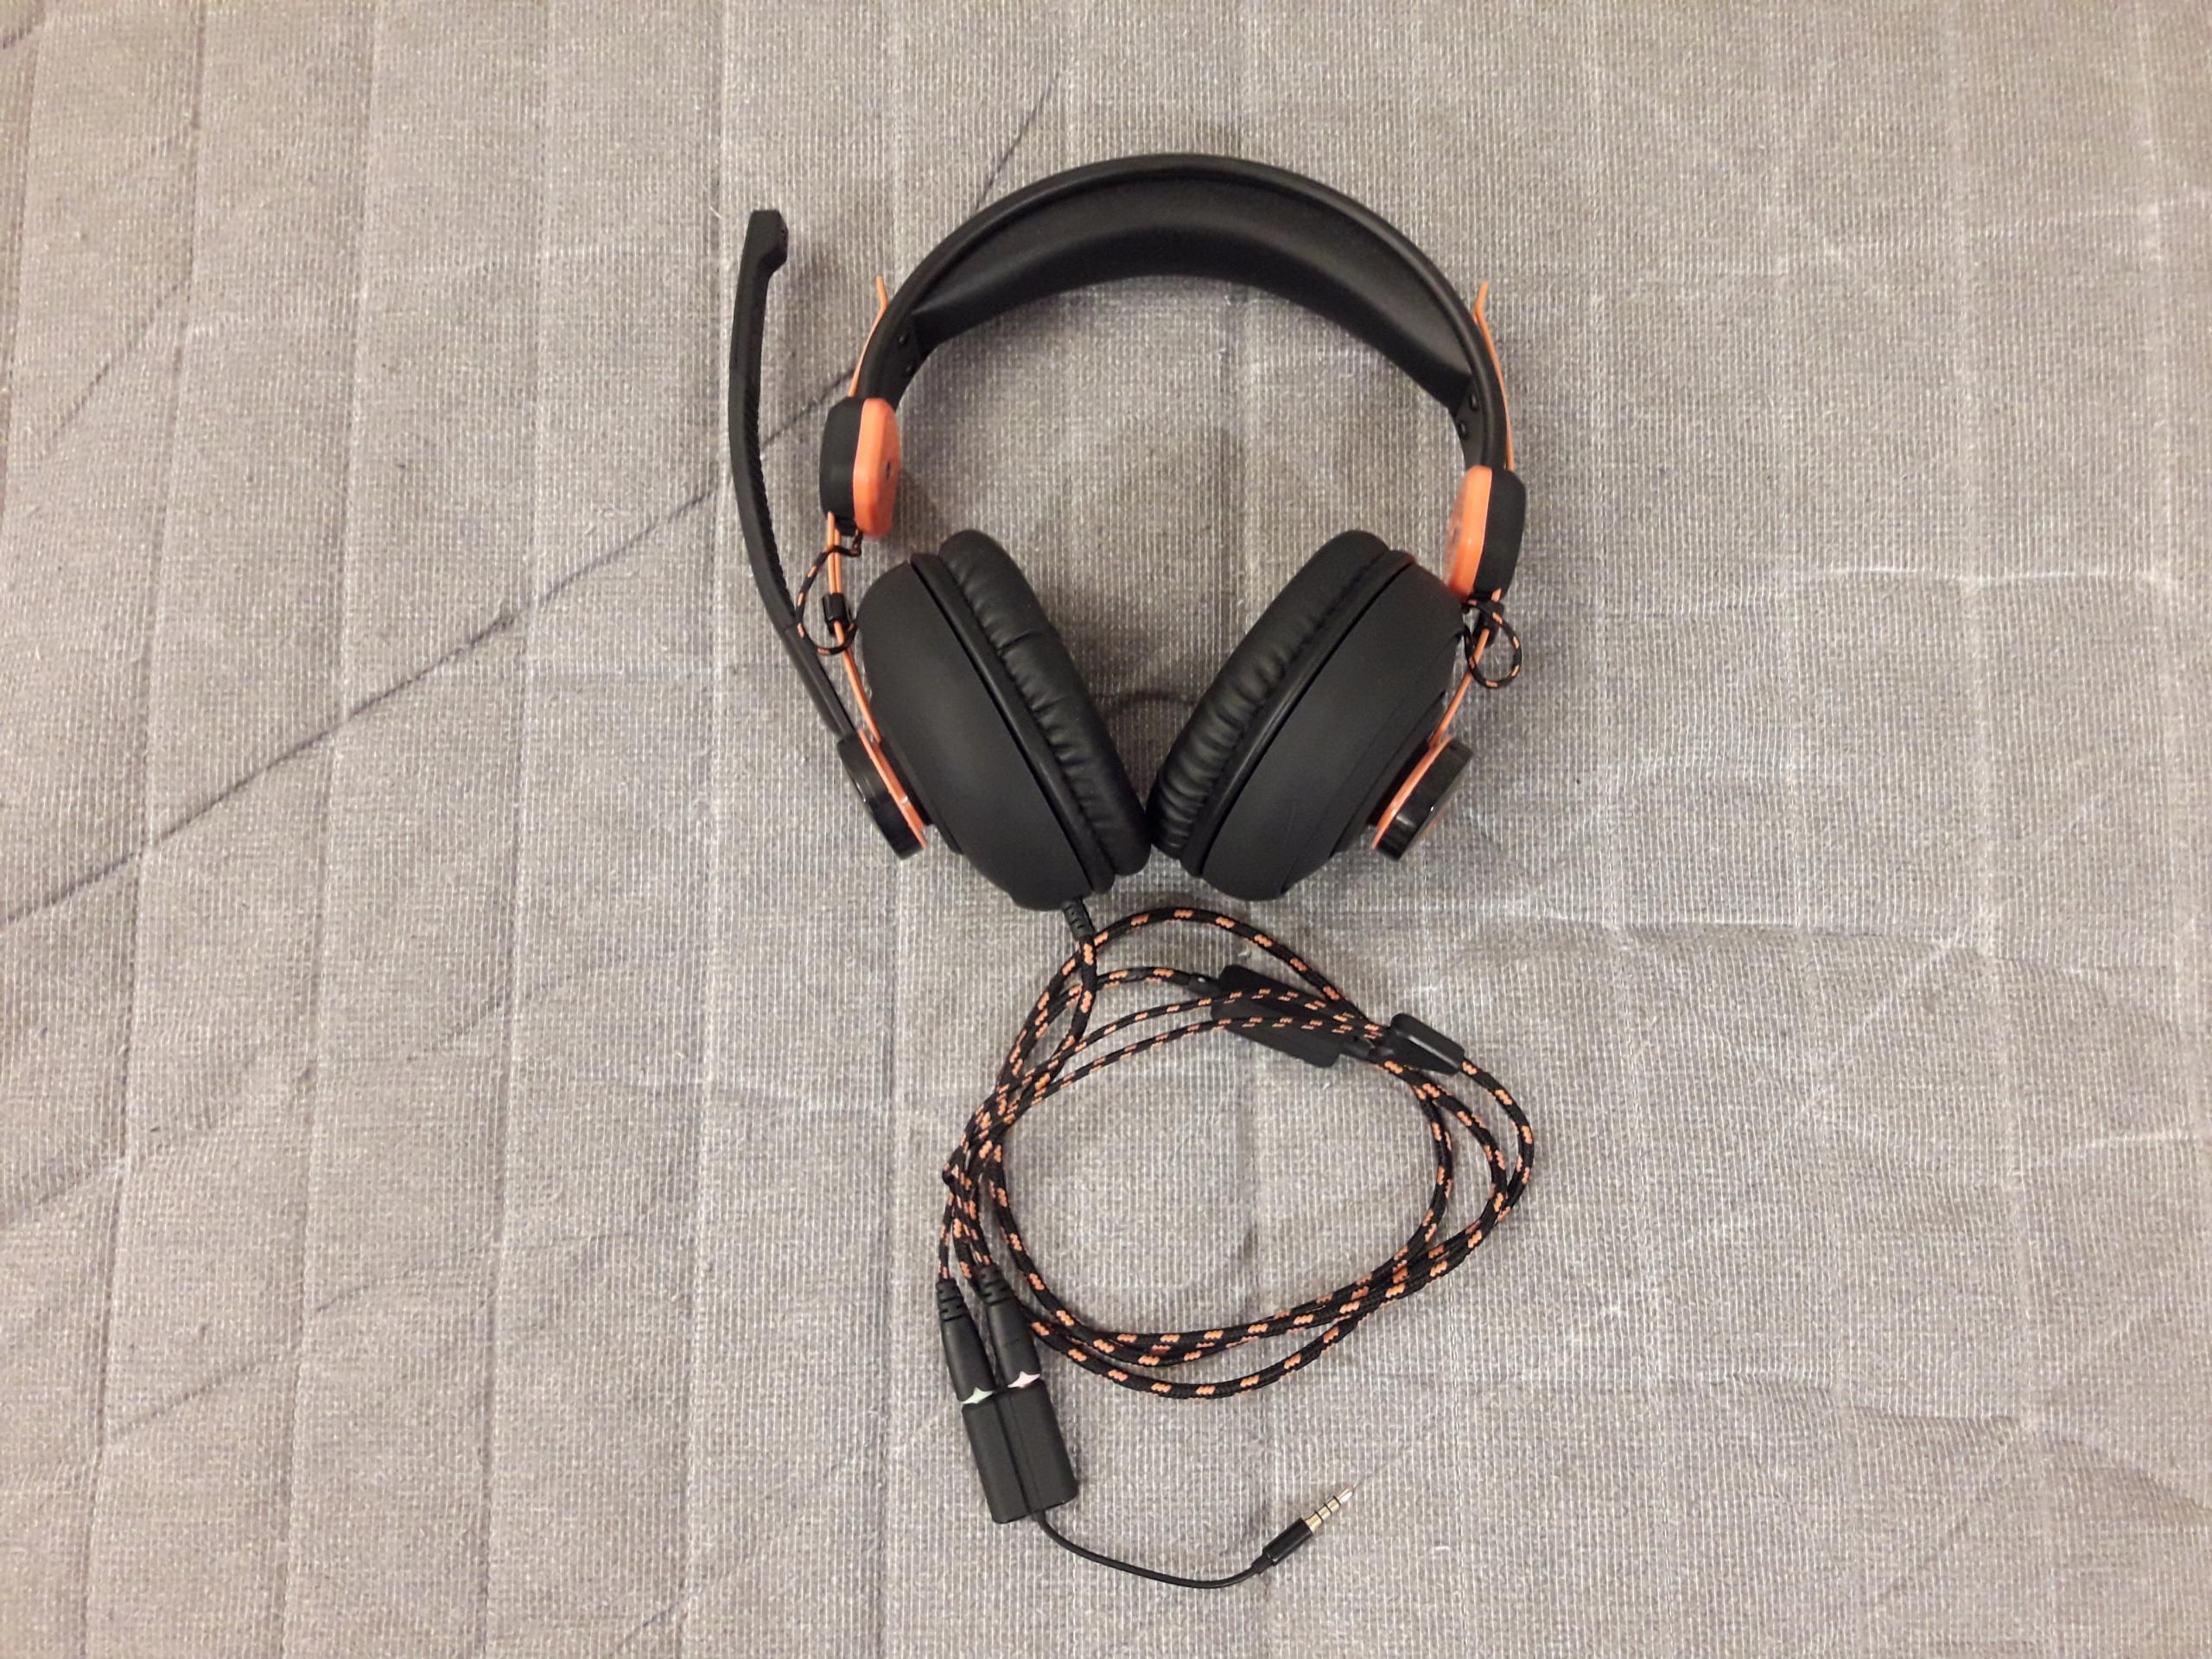 słuchawki ADX Firestorm A01 Gaming Headset